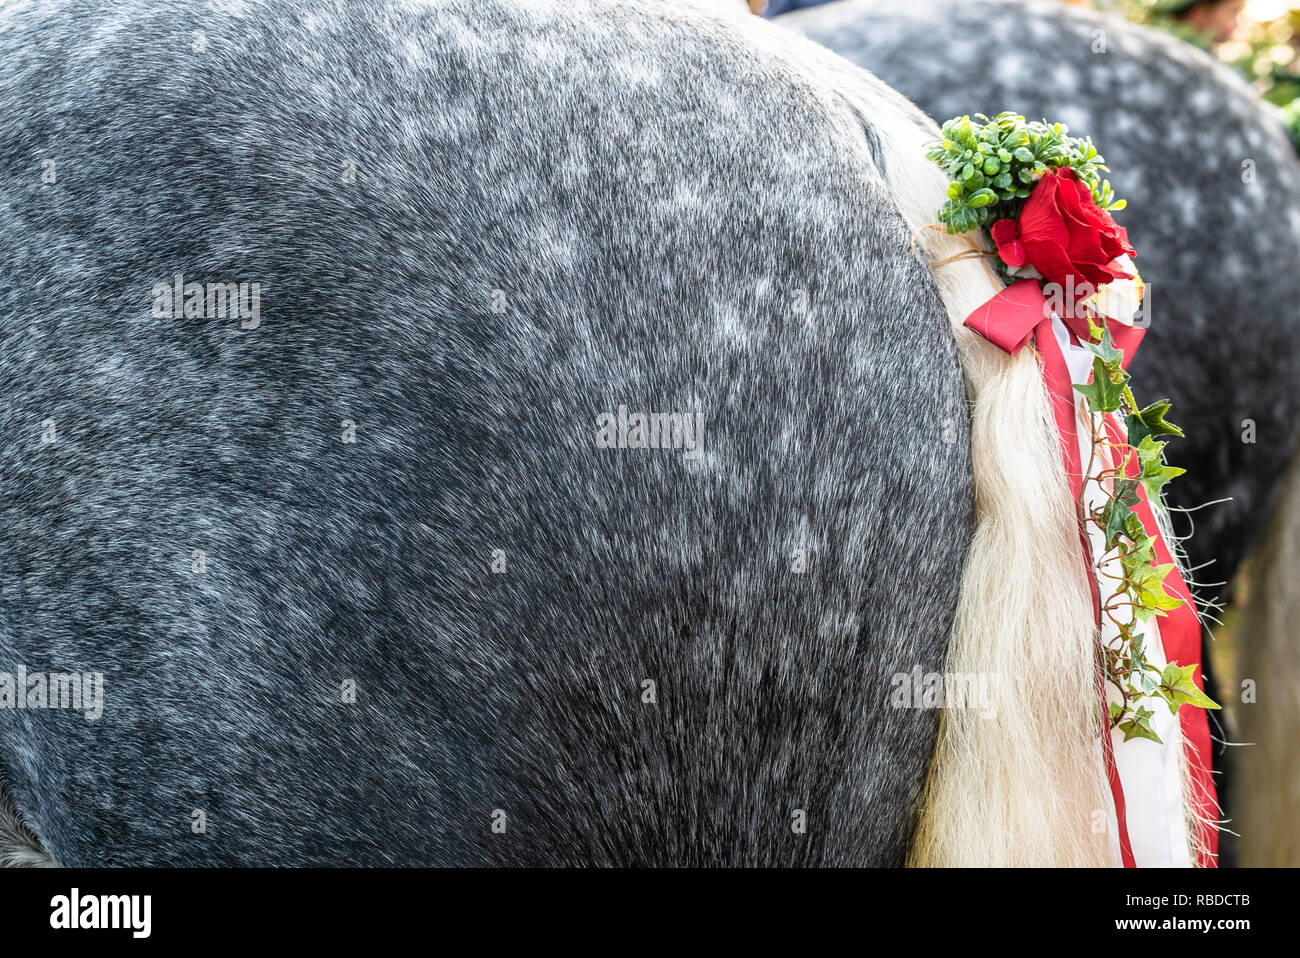 Decorated horses ready to perform at leonhardi parade - Stock Image